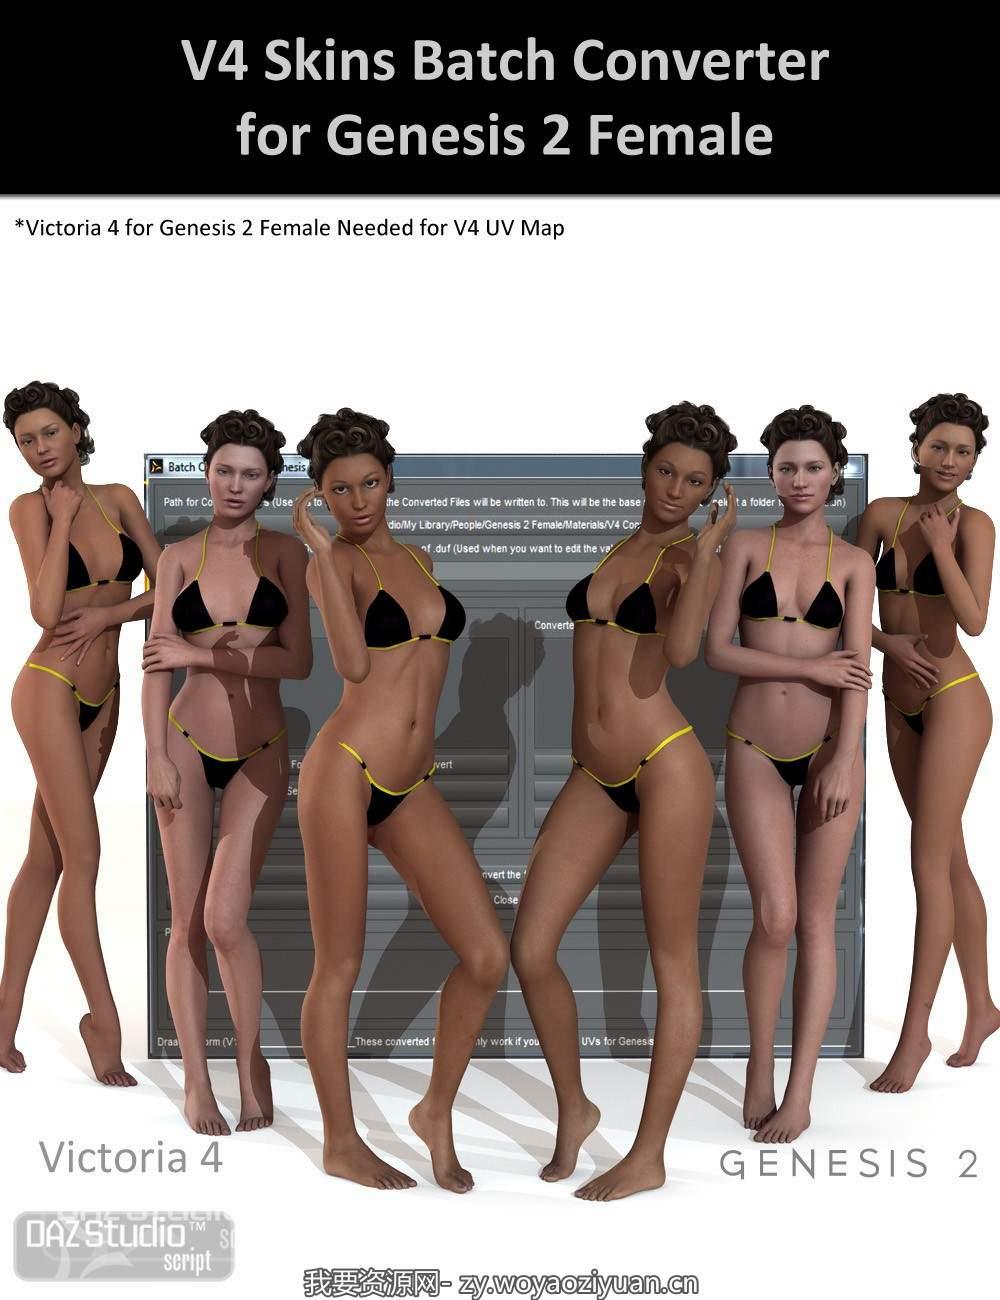 V4 Skins Batch Converter to Genesis 2 Female(s)